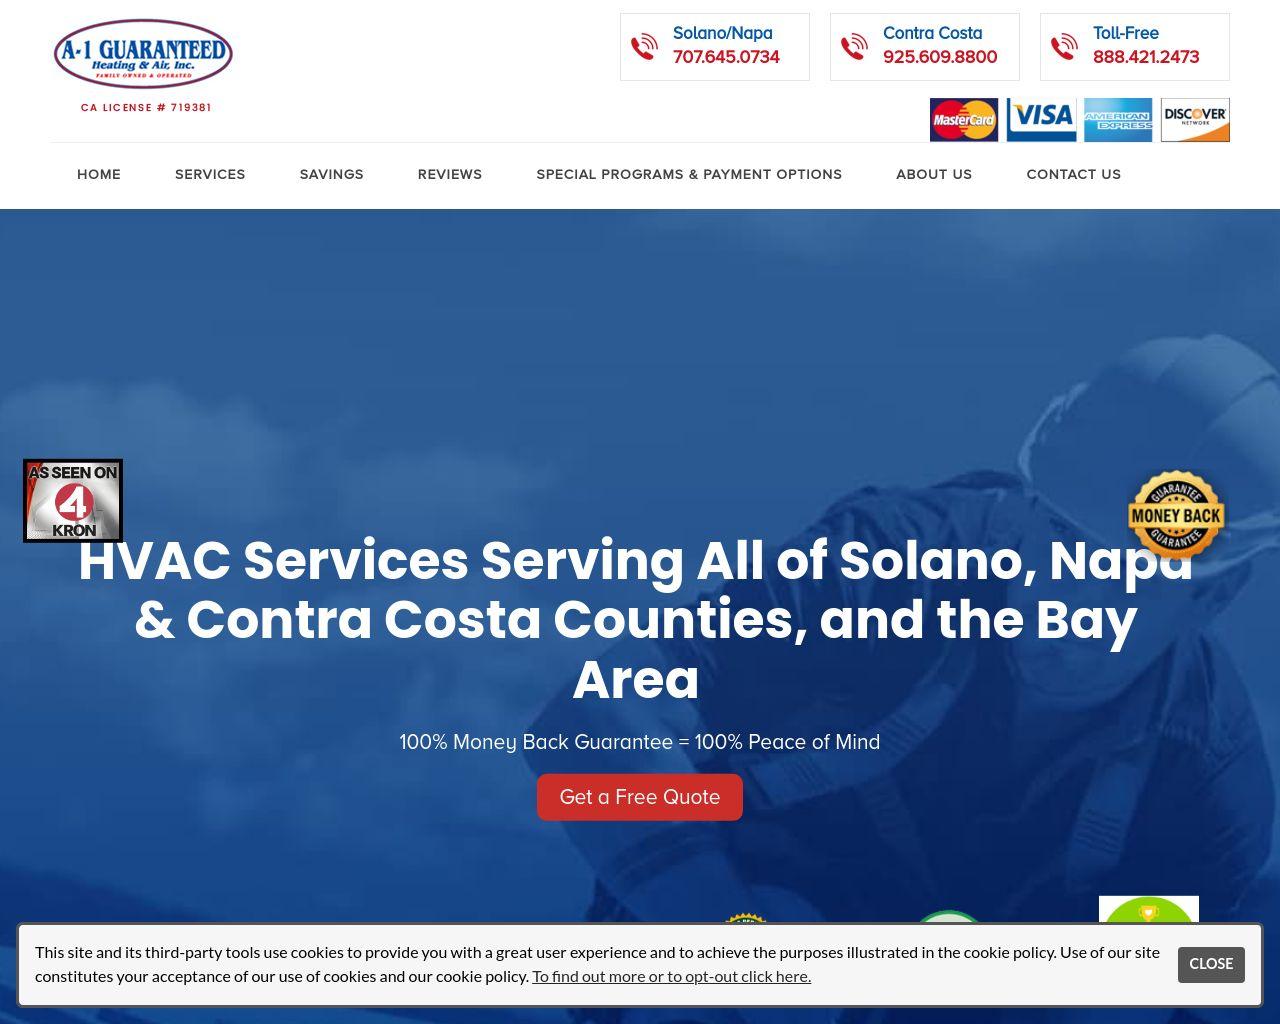 A-1 Guaranteed Heating & Air | Solano County HVAC | Diamond